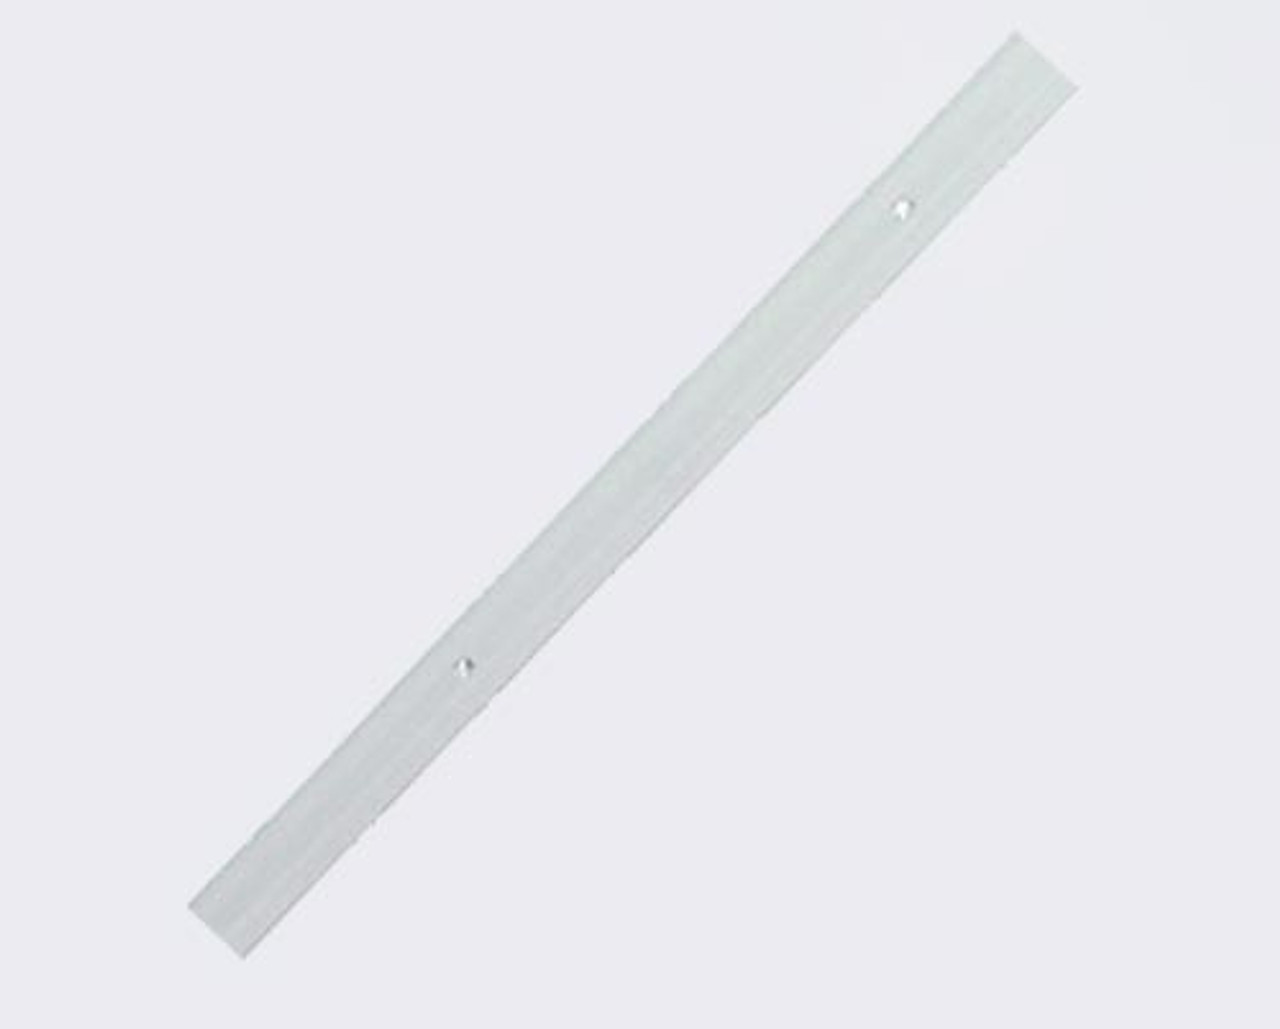 MeshGuard Steel Strip 8' (20 Pack)